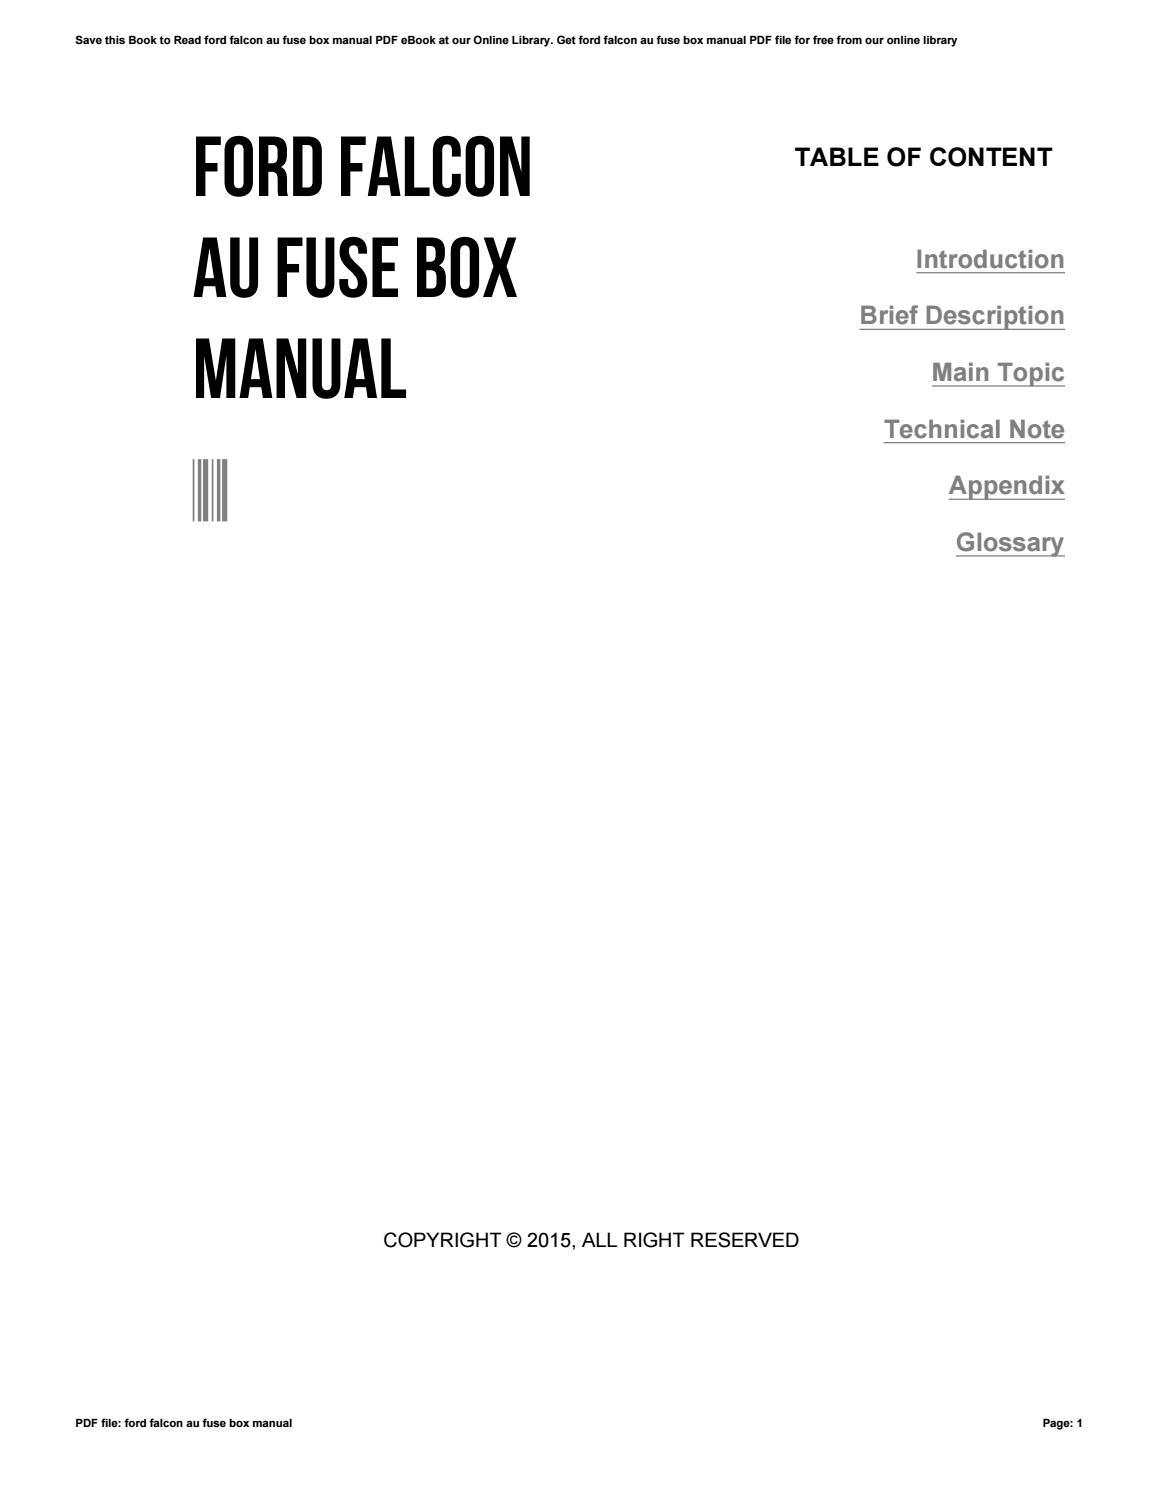 Ford falcon au fuse box manual by mnode1 - issuuIssuu